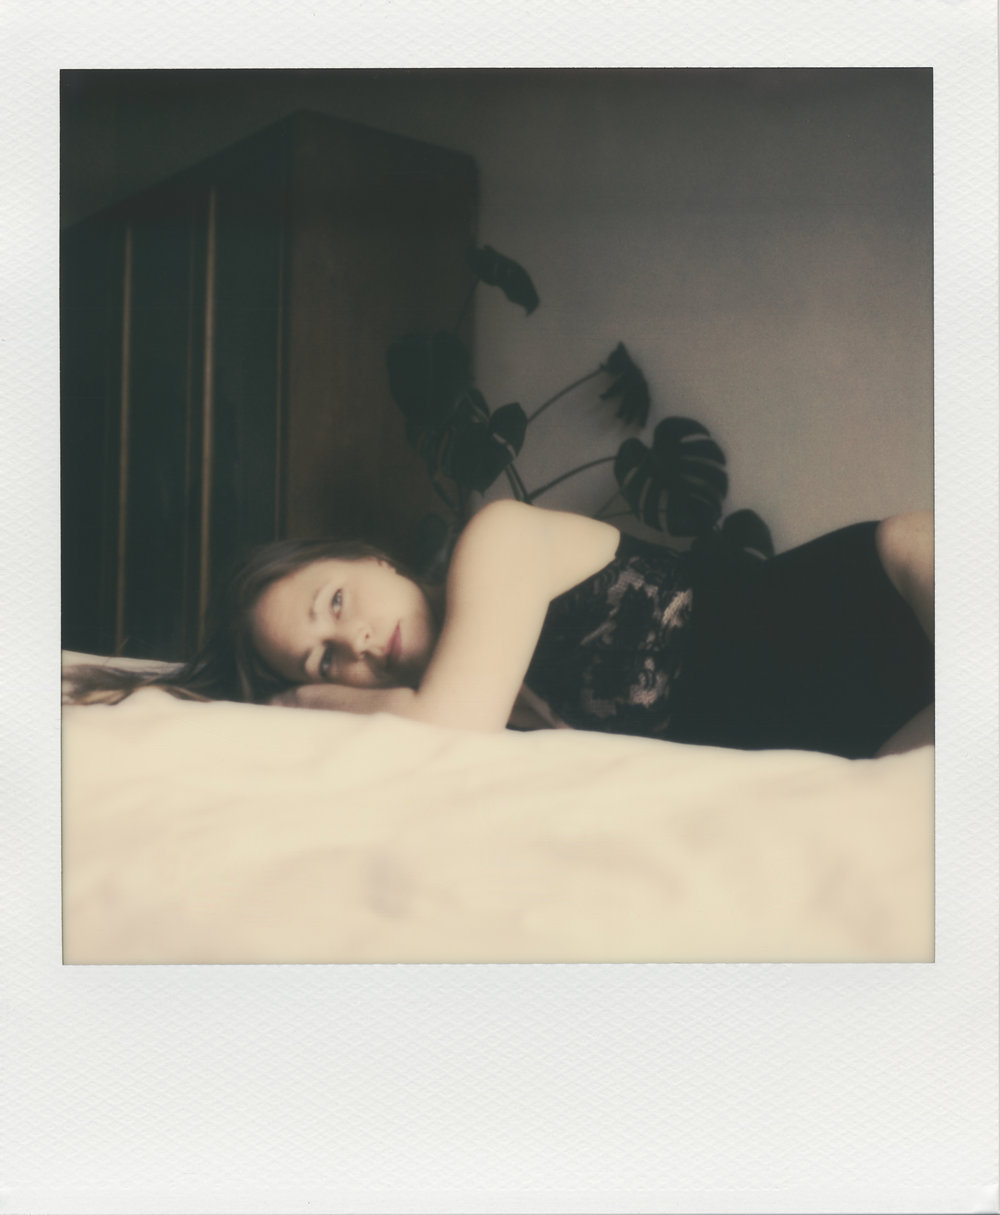 Jennifer_Rumbach_Polaroids_SW_190408_10.jpg